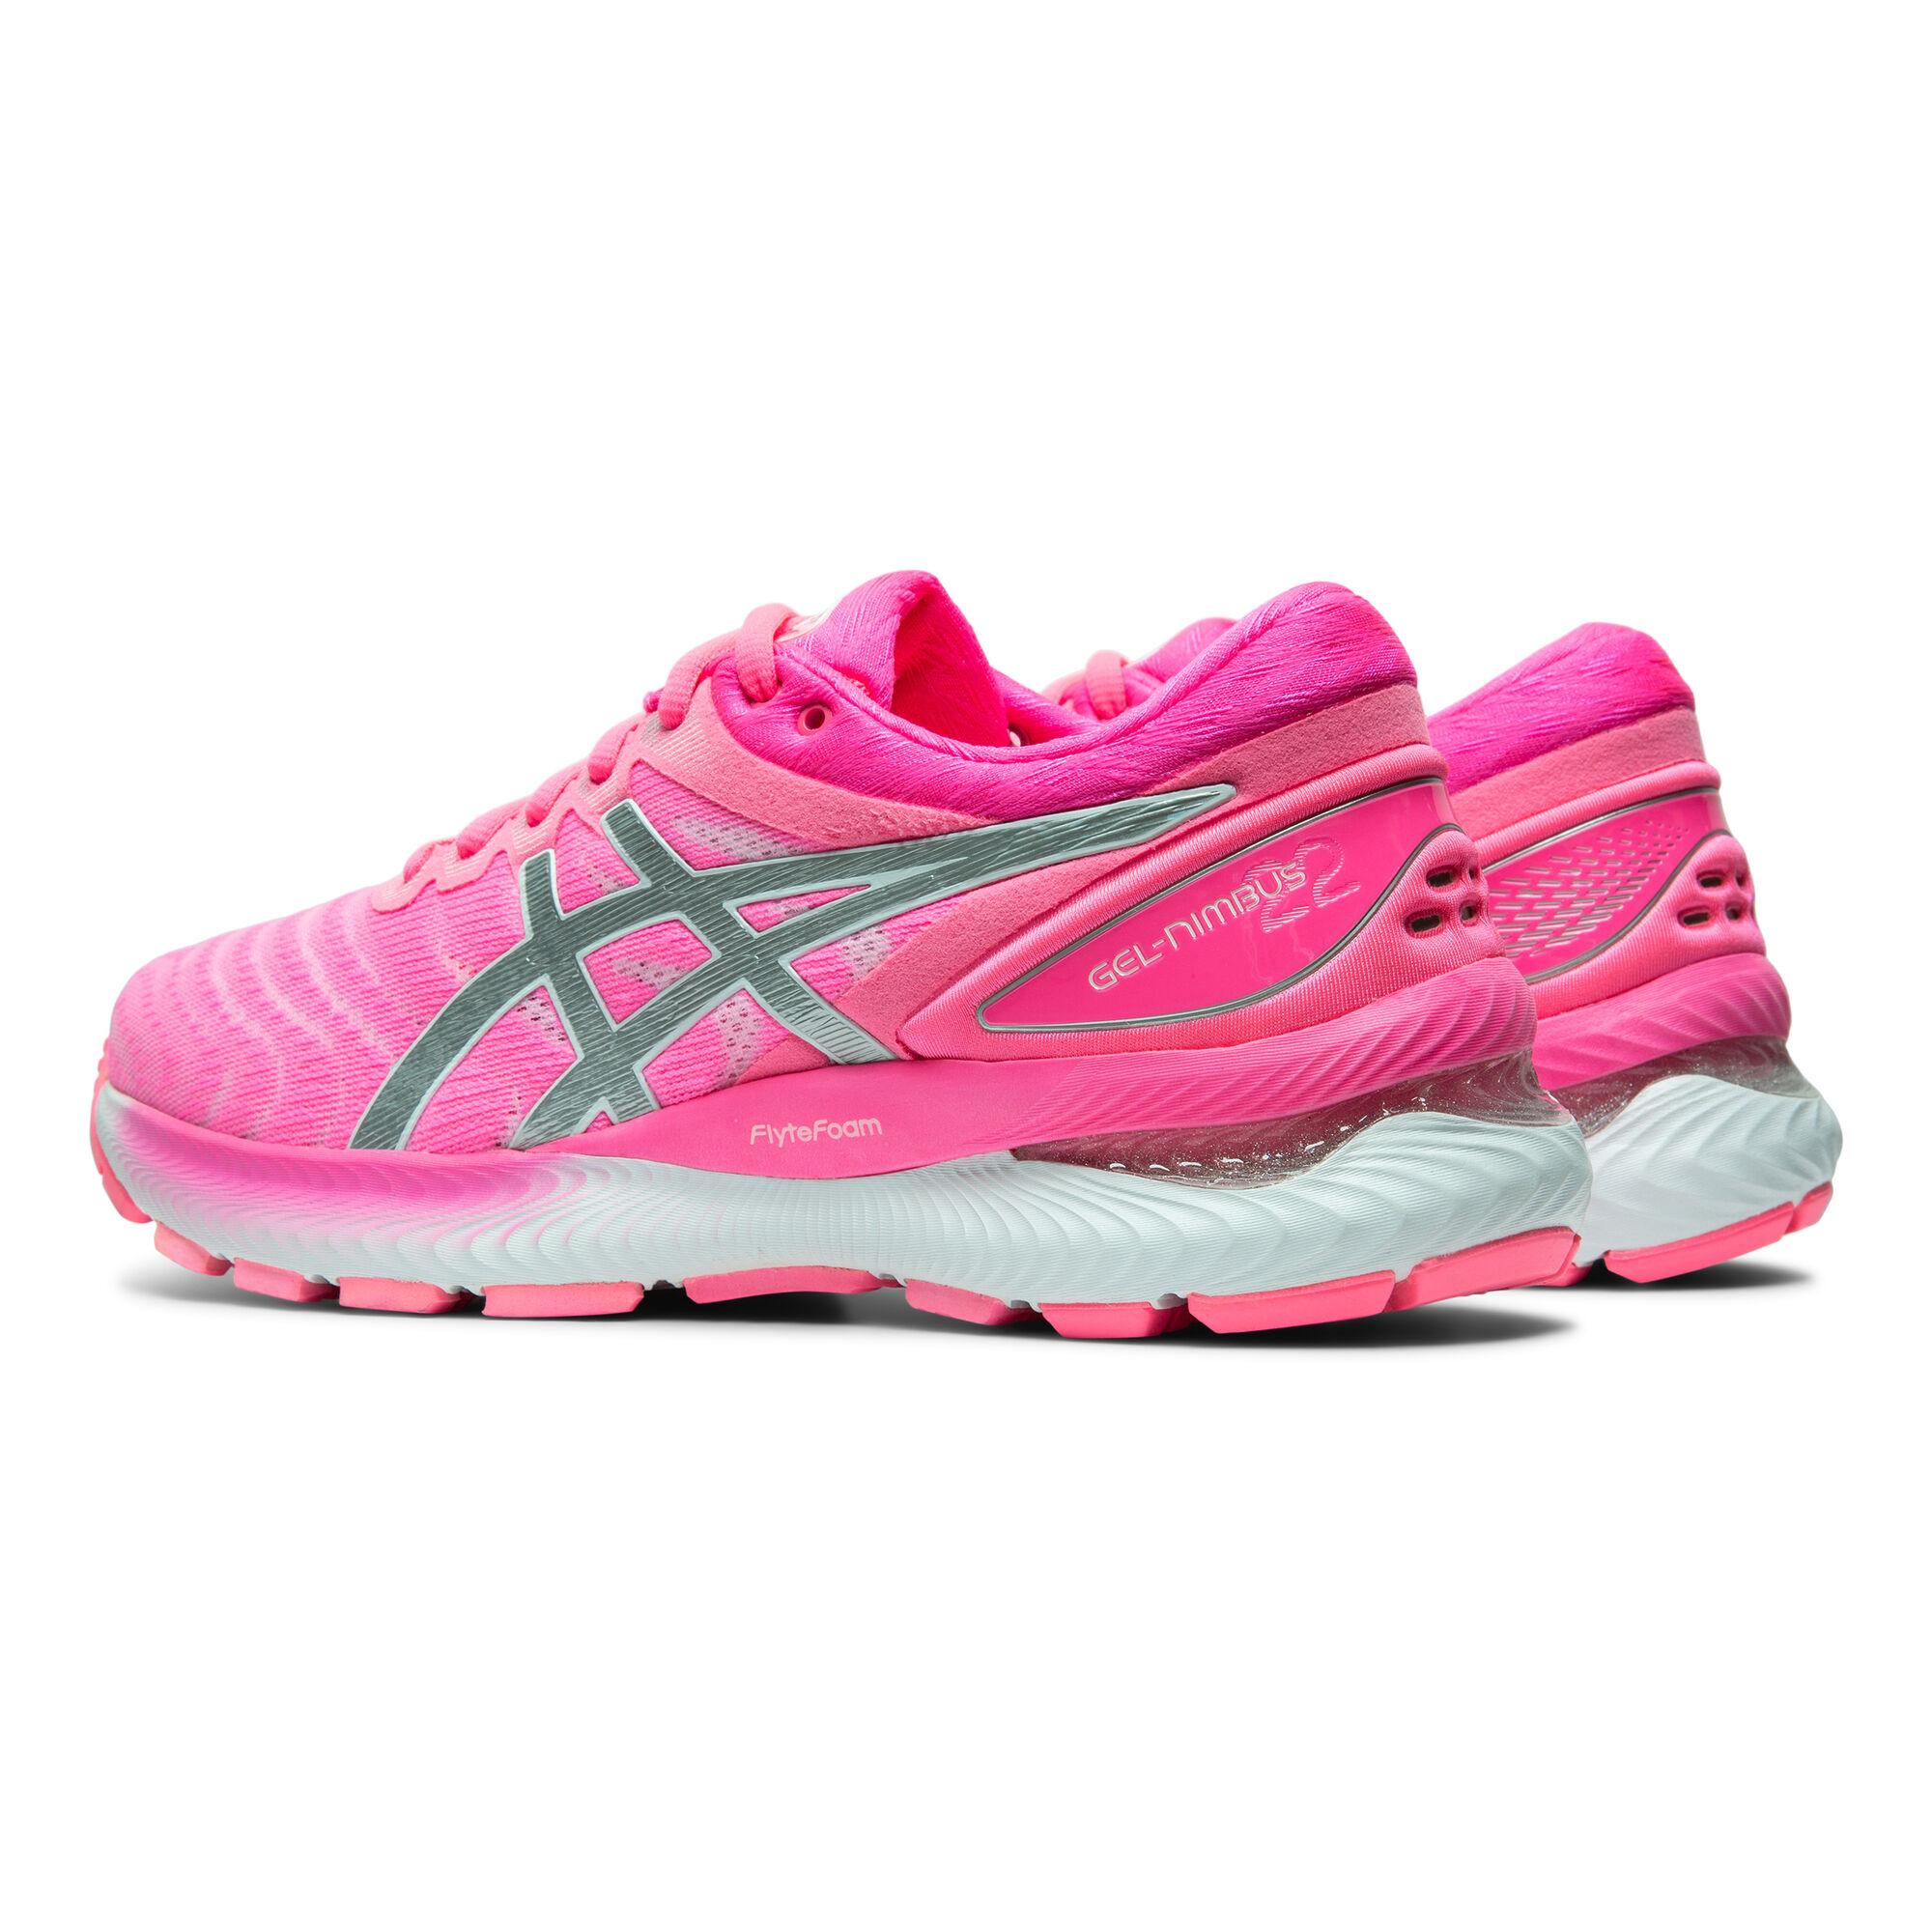 Assistere accento gettare fumo negli occhi  buy Asics Gel-Nimbus 22 Neutral Running Shoe Women - Pink, Silver online |  Jogging-Point